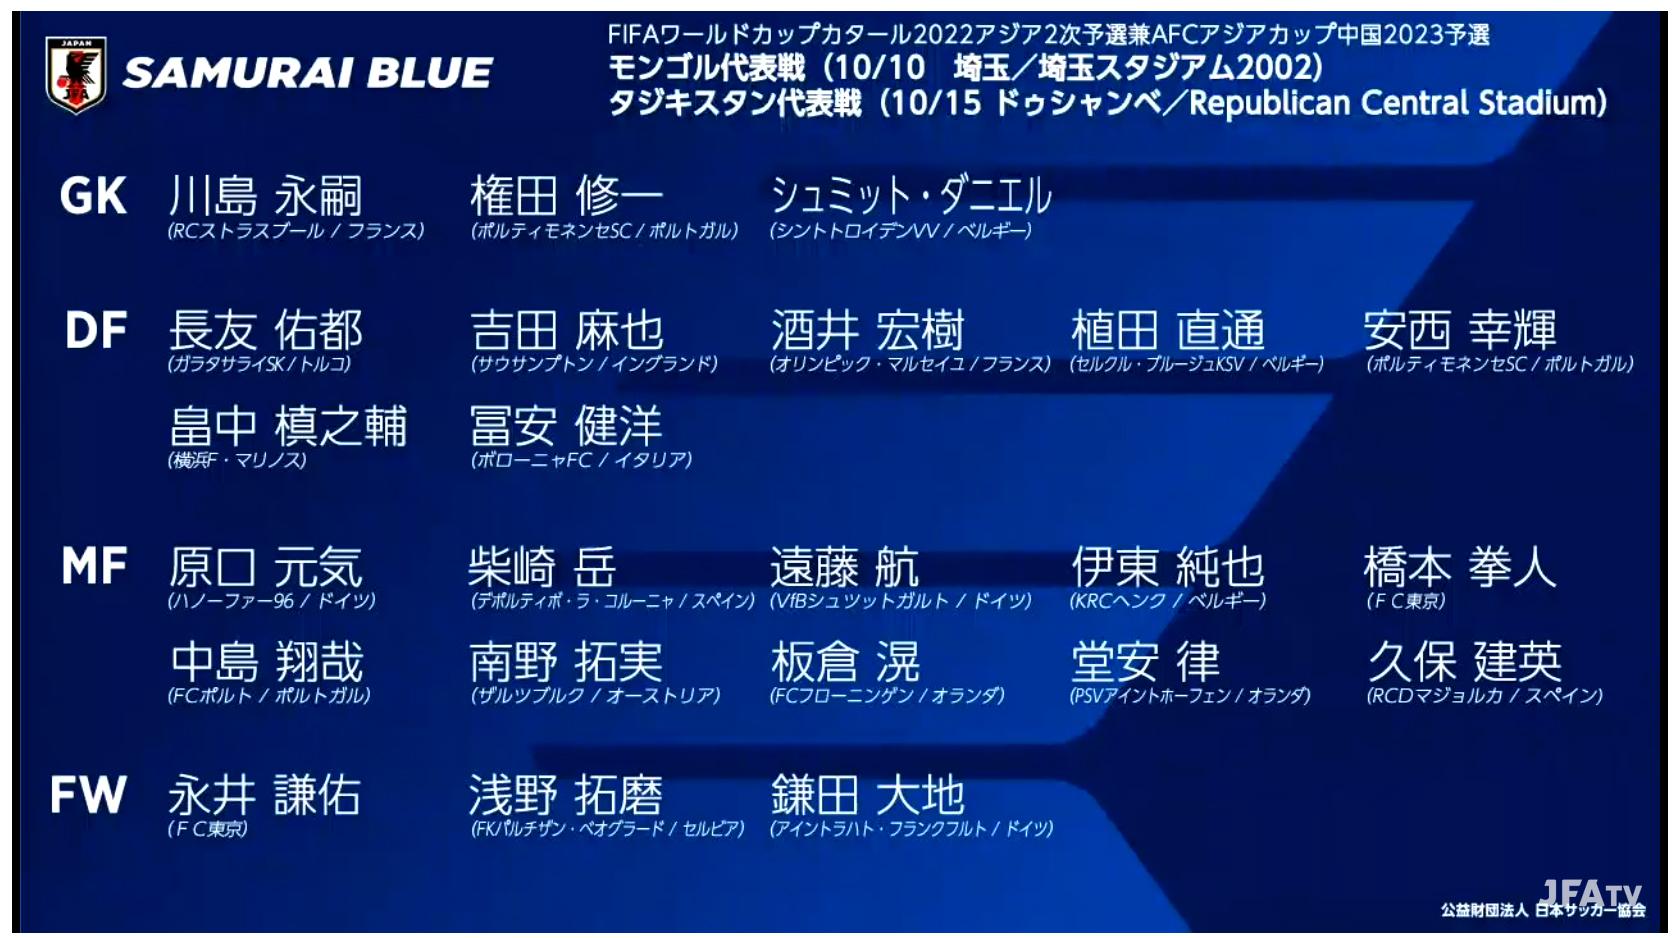 W杯2次予選に臨む SAMURAI BLUE 日本代表